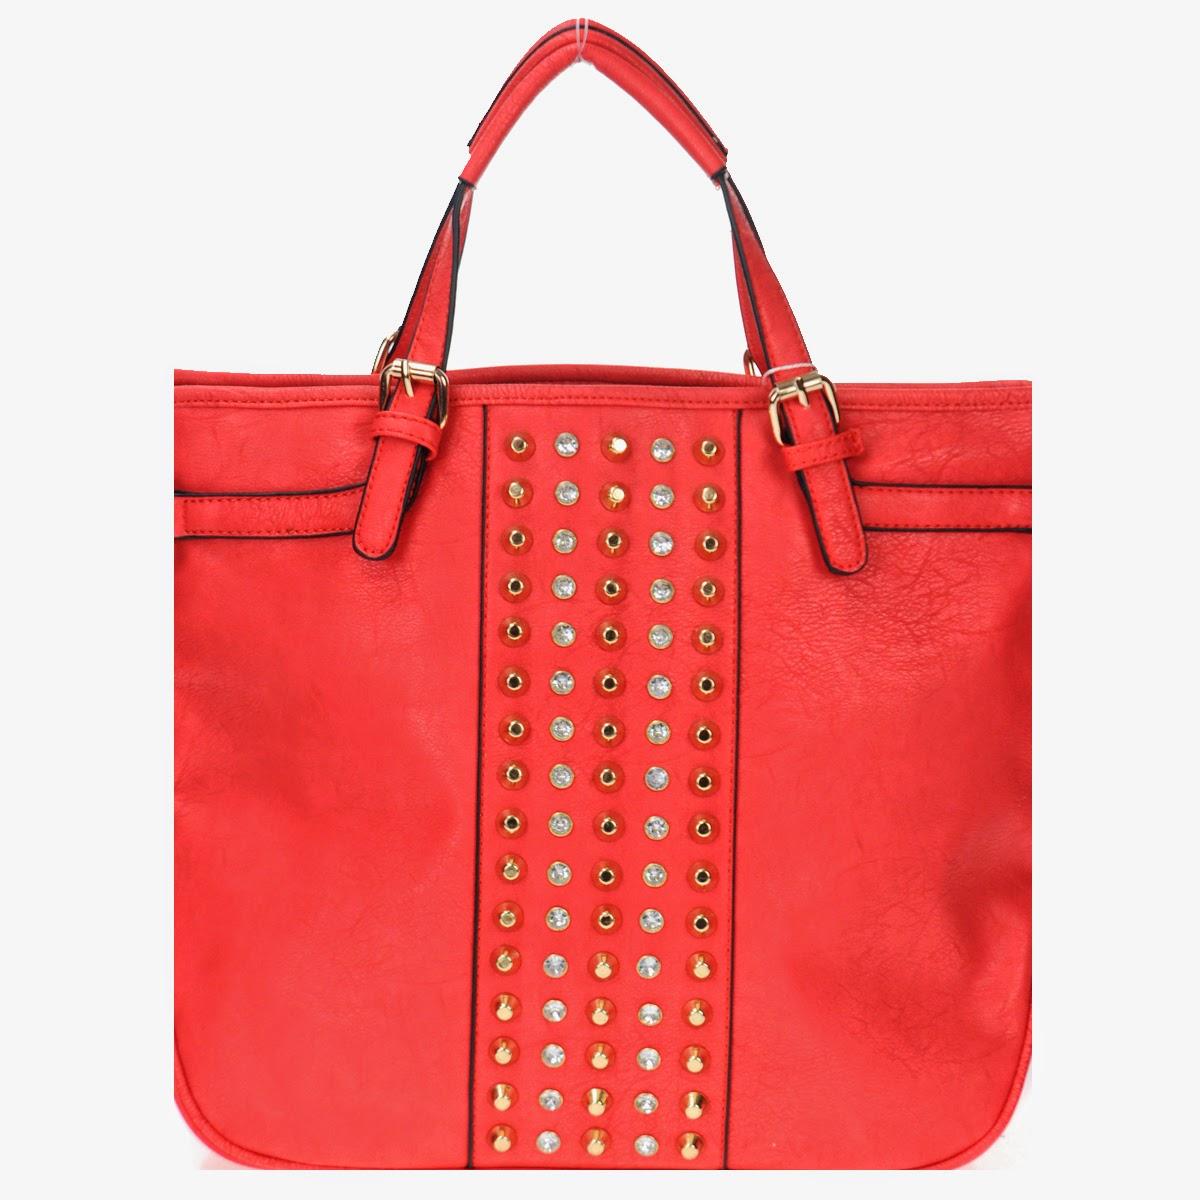 wholesale fashion handbags and purses